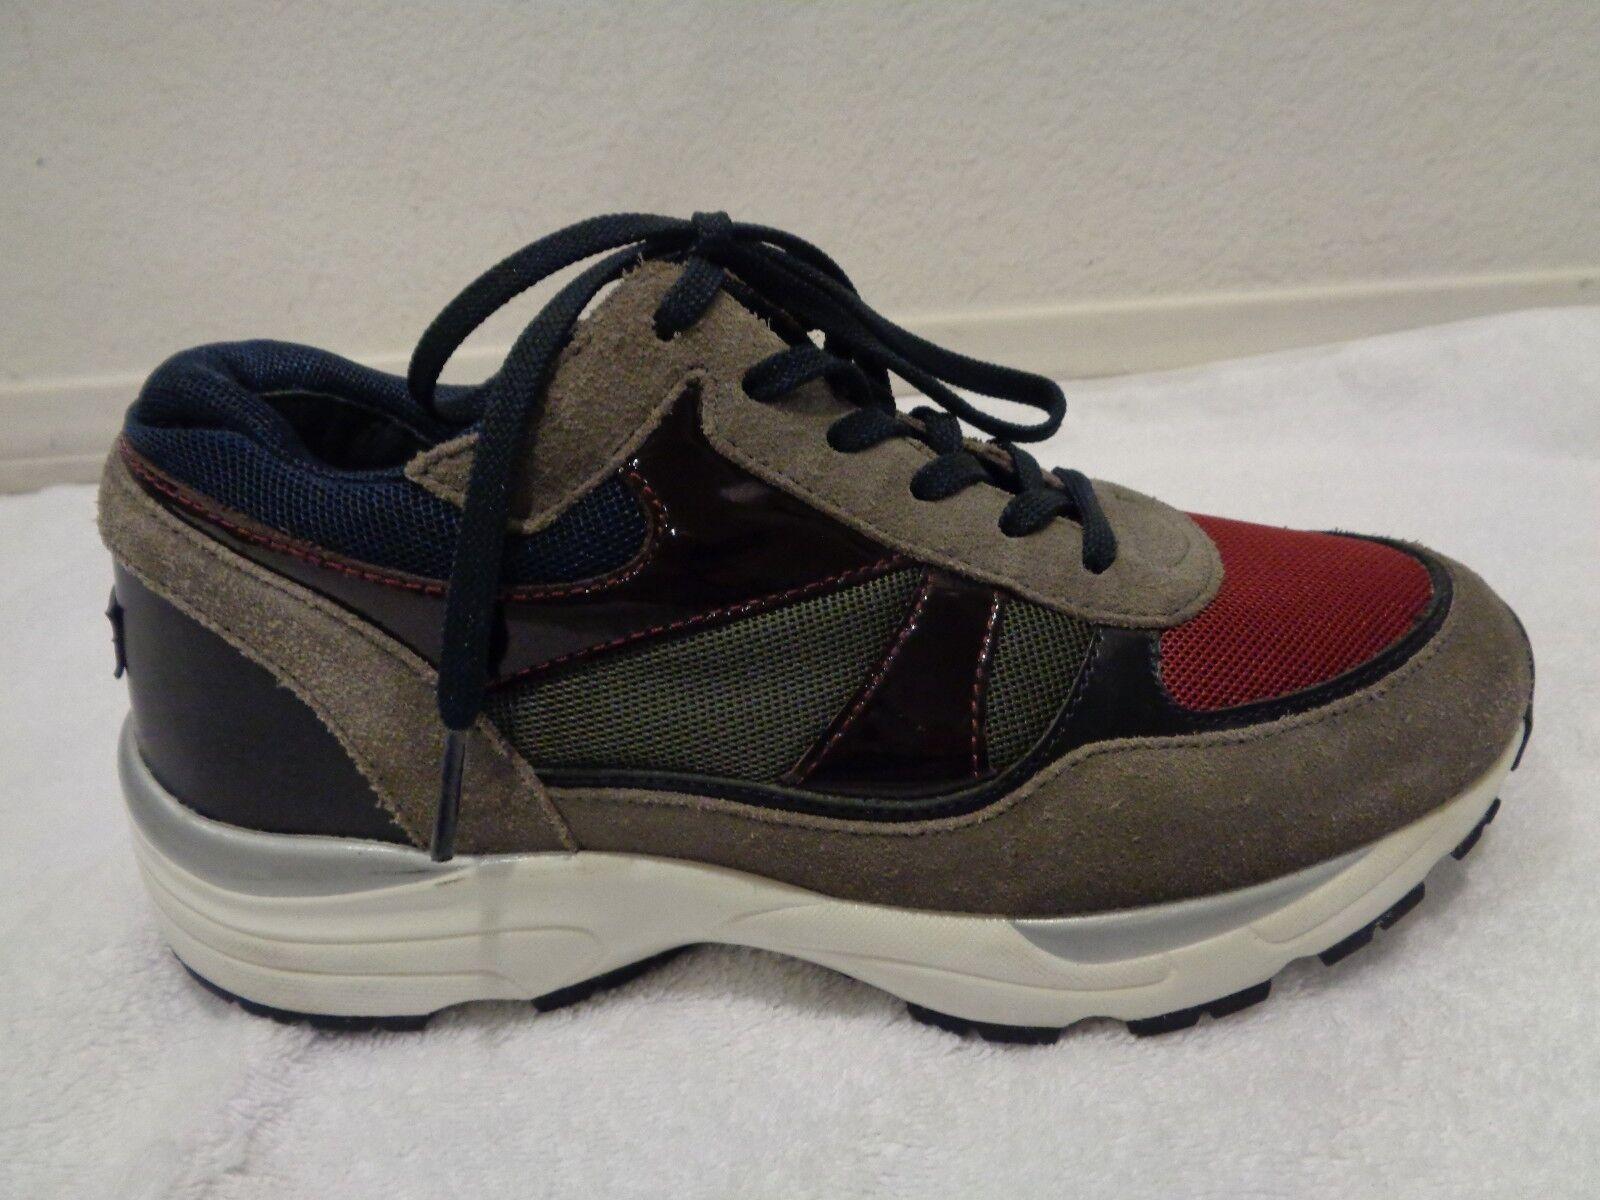 Suecomma Bonnie multi coloROT US women's Sneakers SZ 7.5 US coloROT eadb06